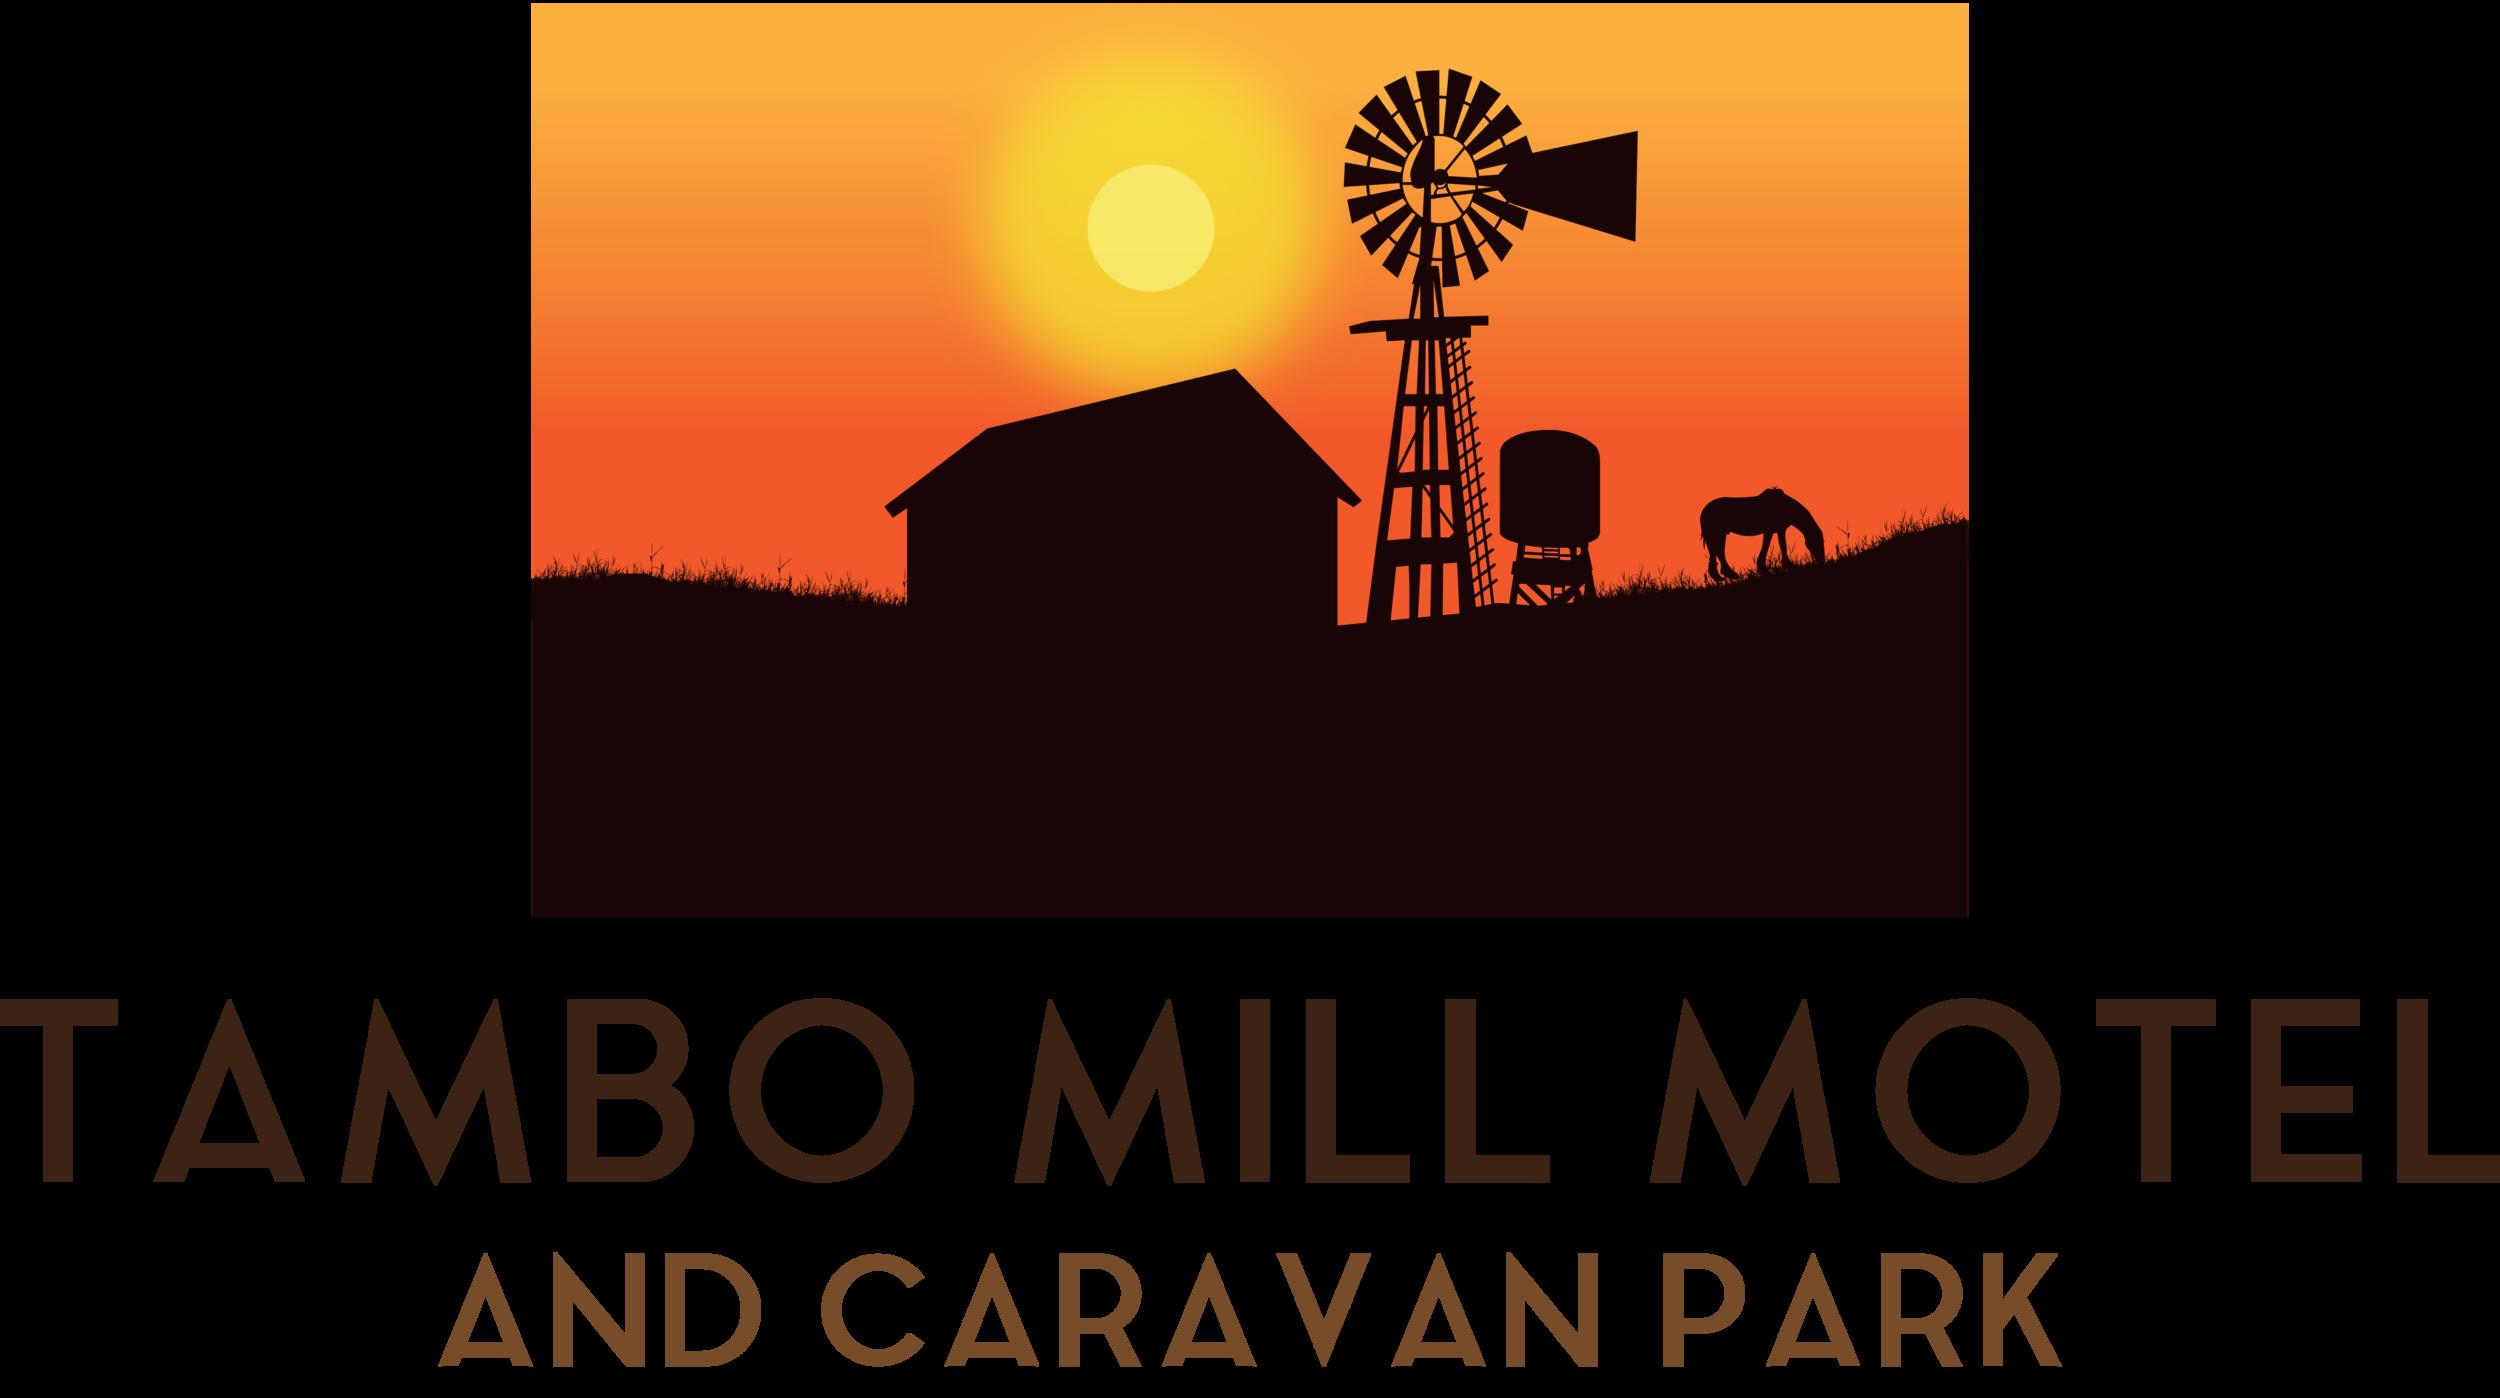 tambo motel logo.png